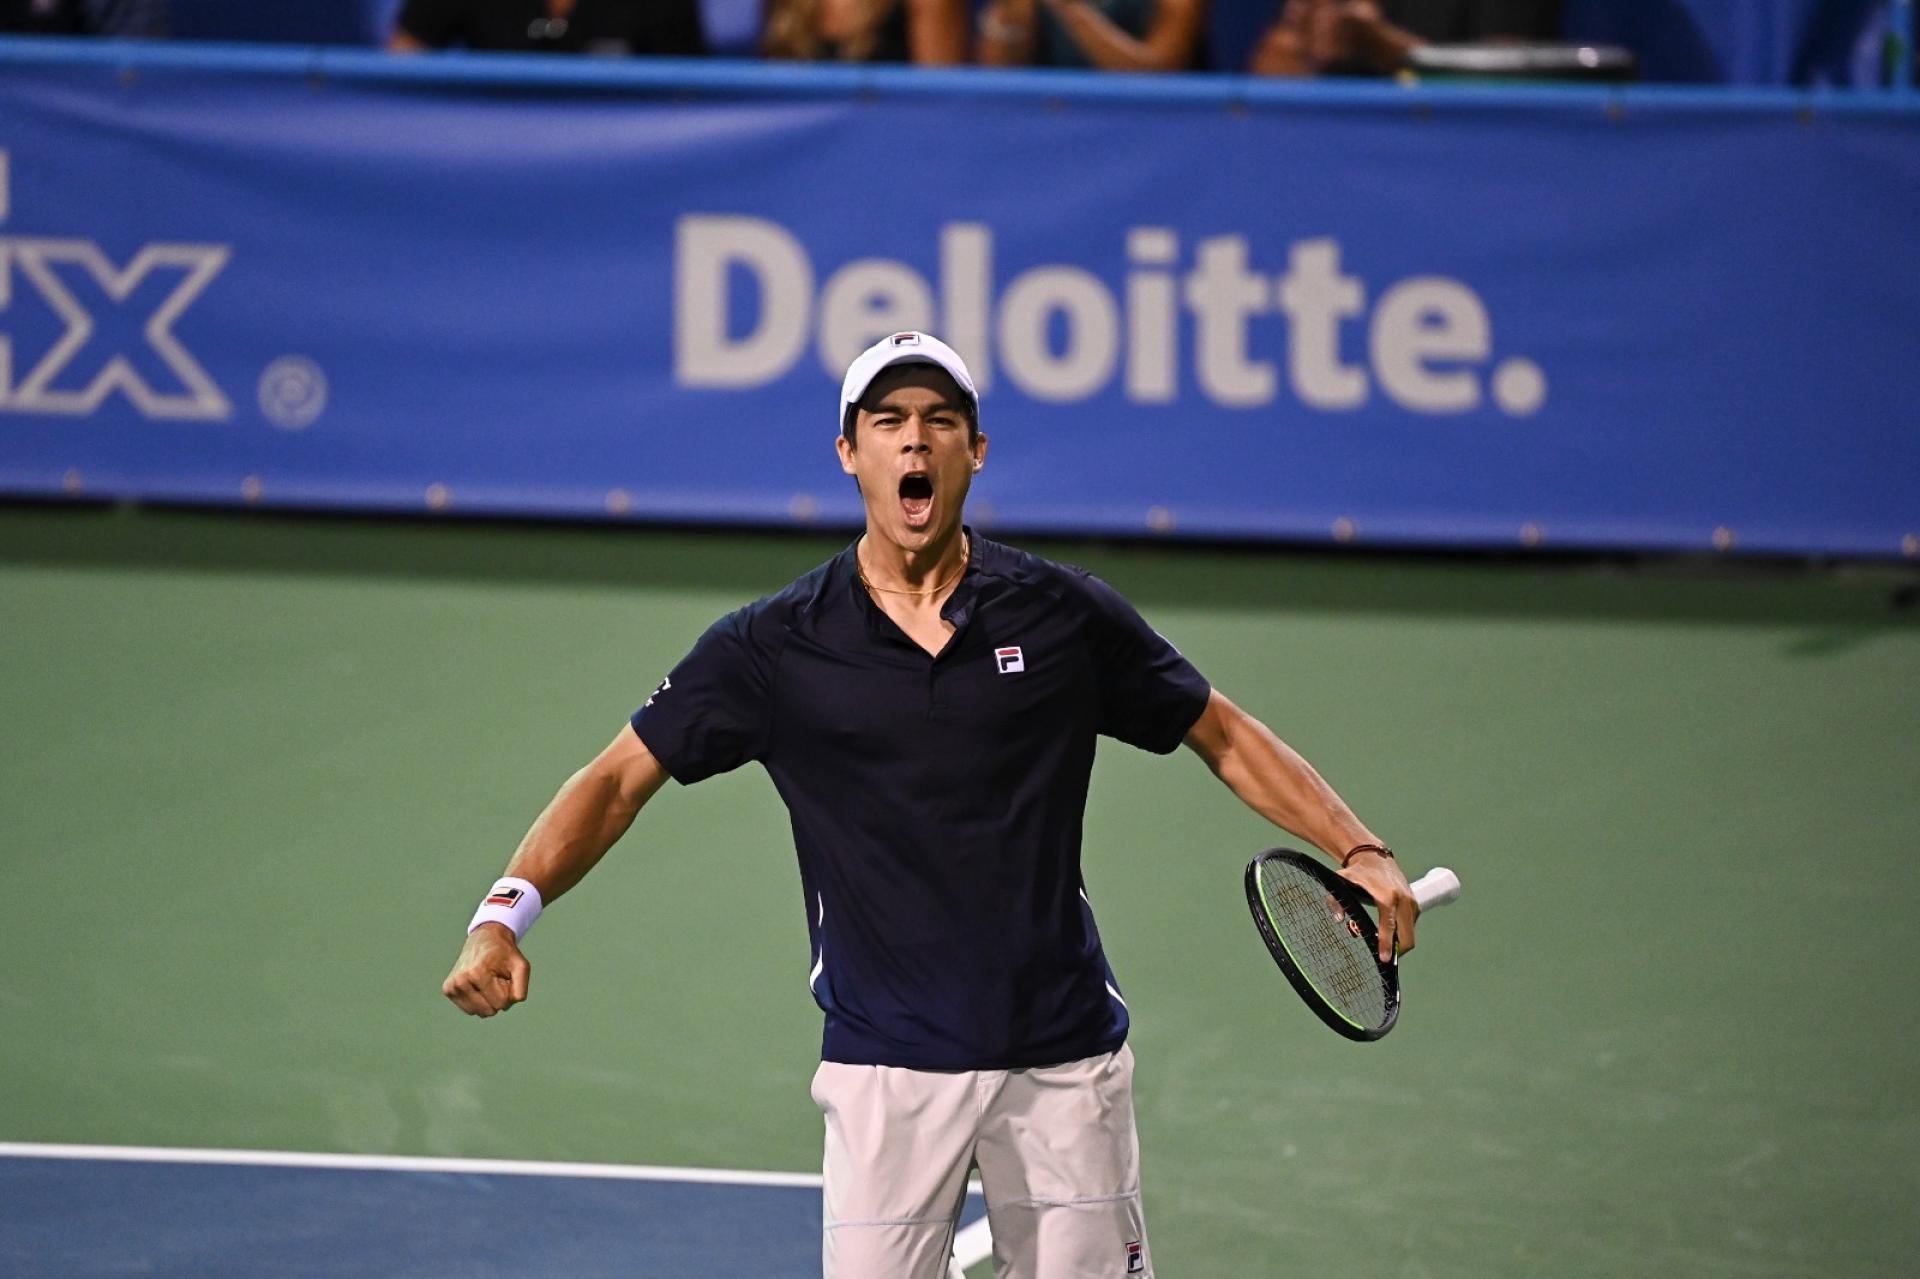 Toronto Open 2021: Benoit Paire vs. Mackenzie McDonald Tennis Pick and Prediction